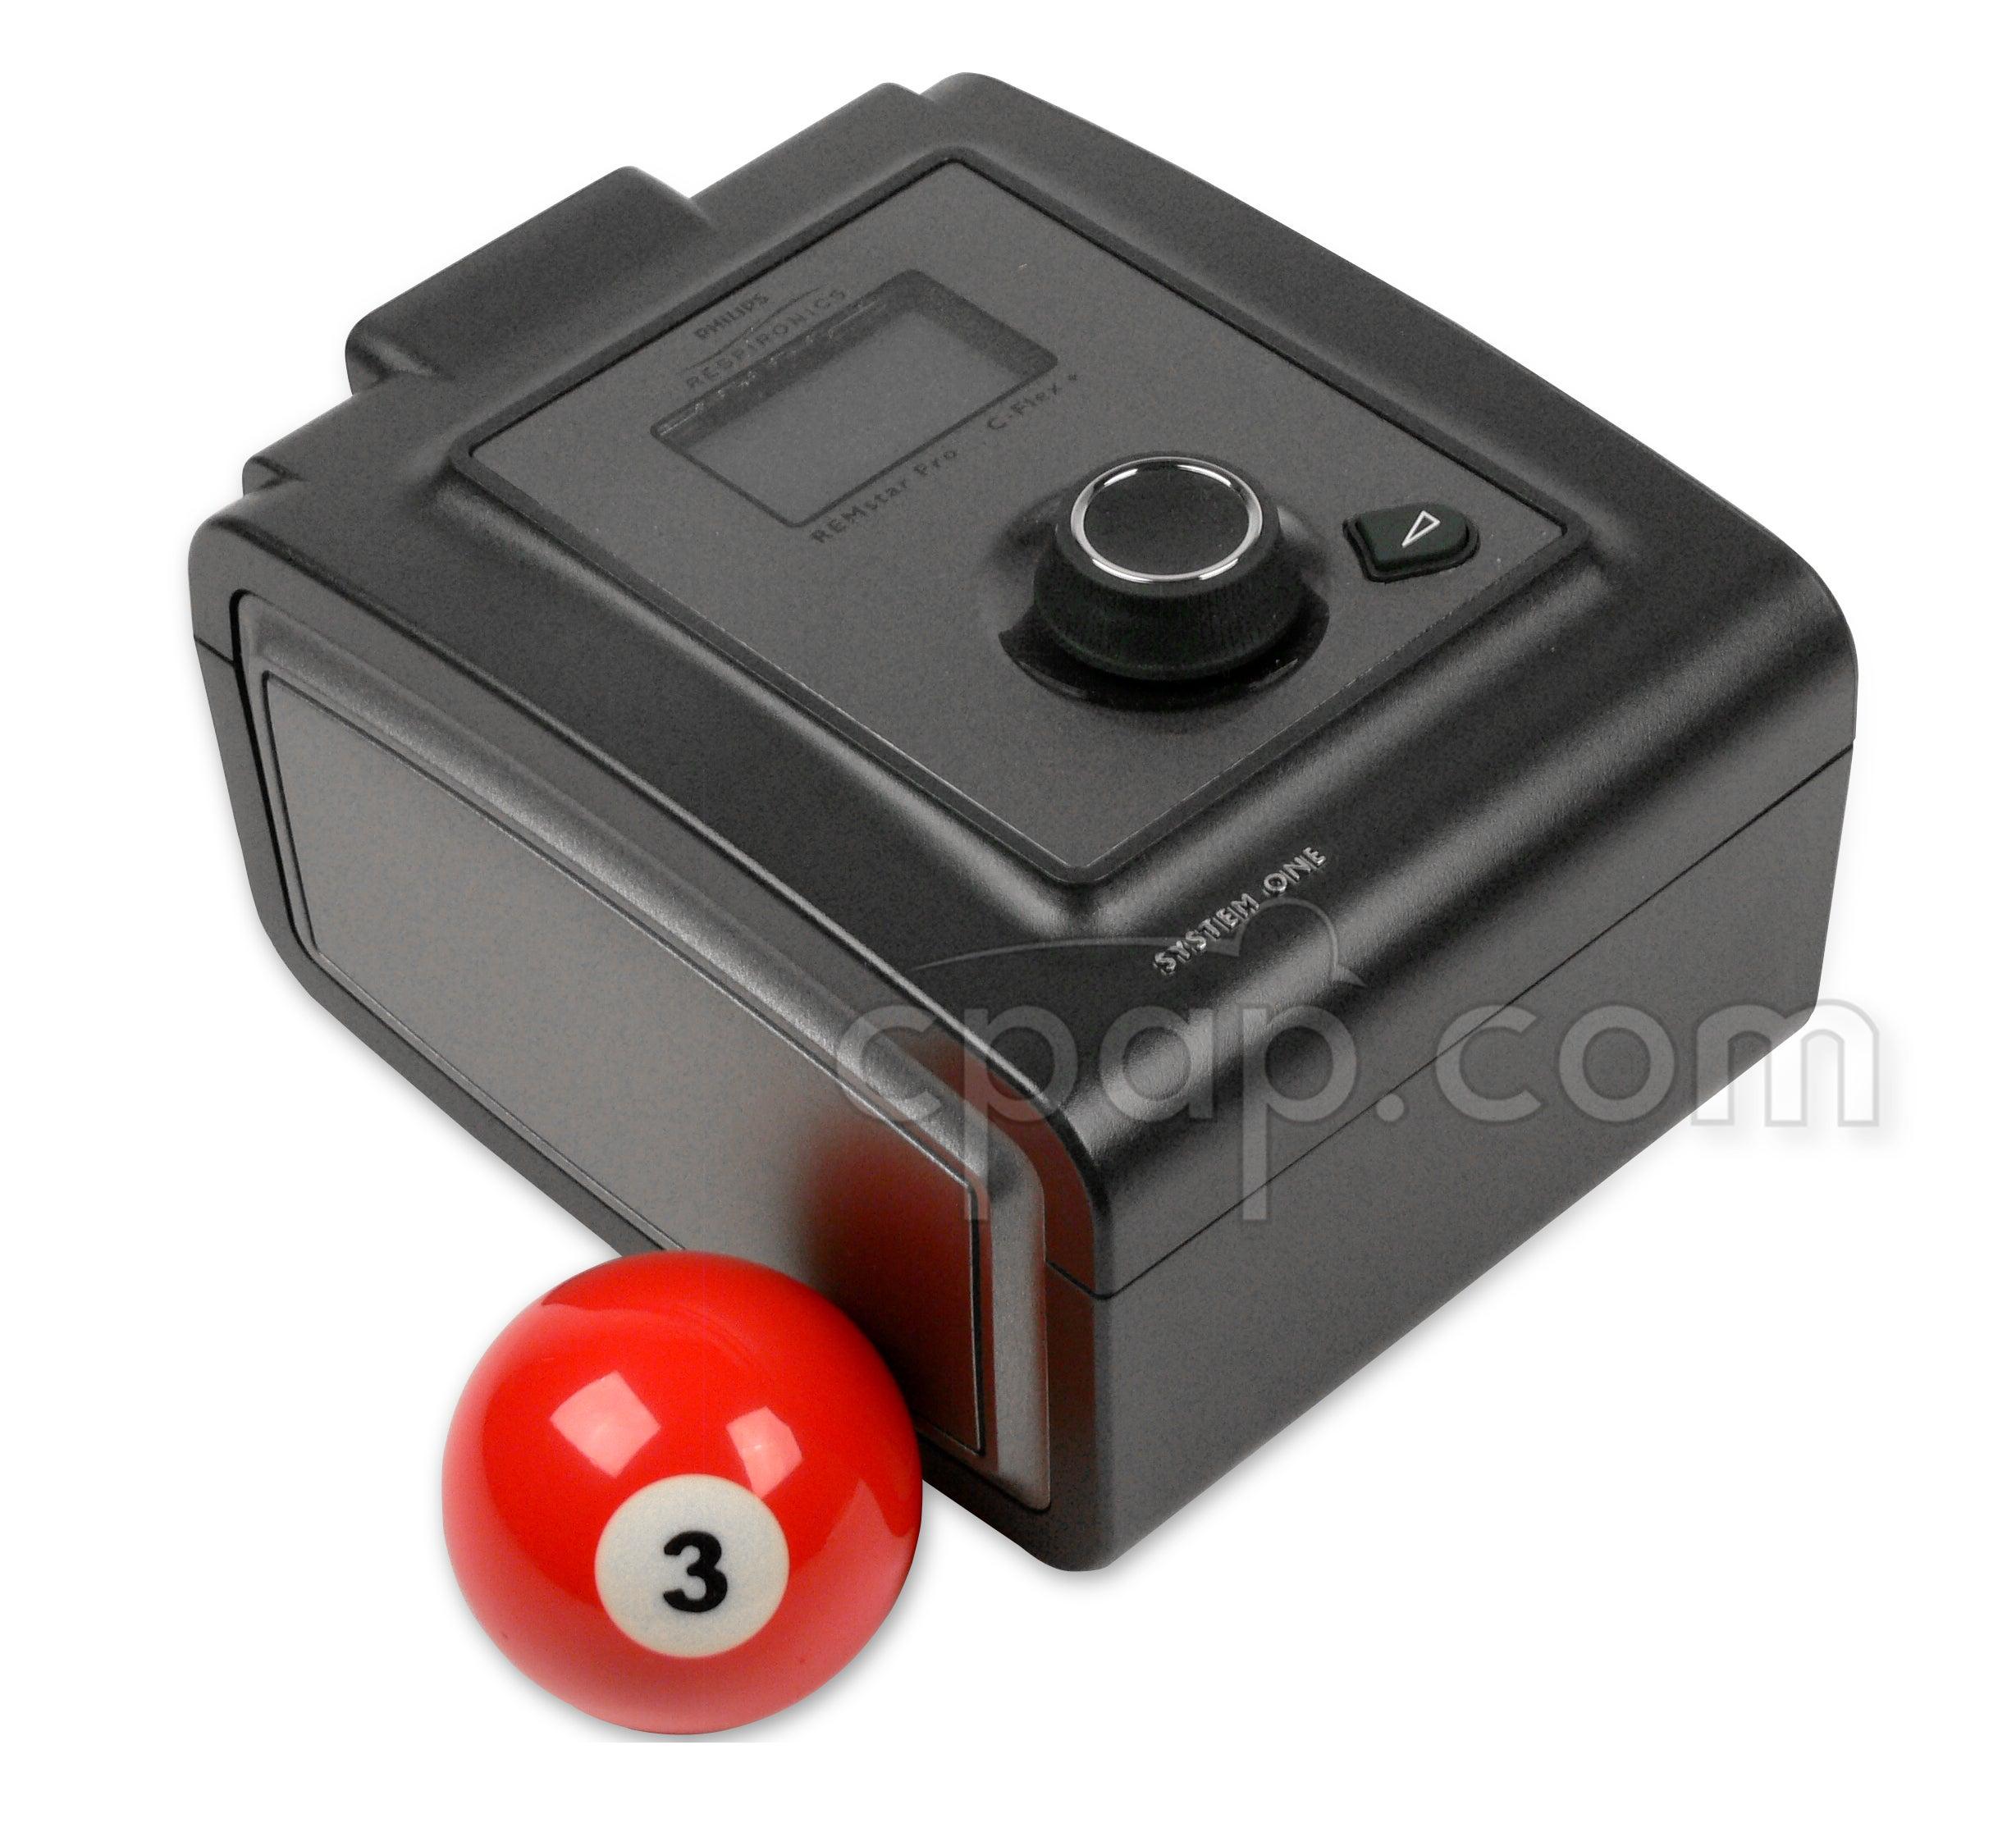 PR System One 60 Series Pro CPAP Machine